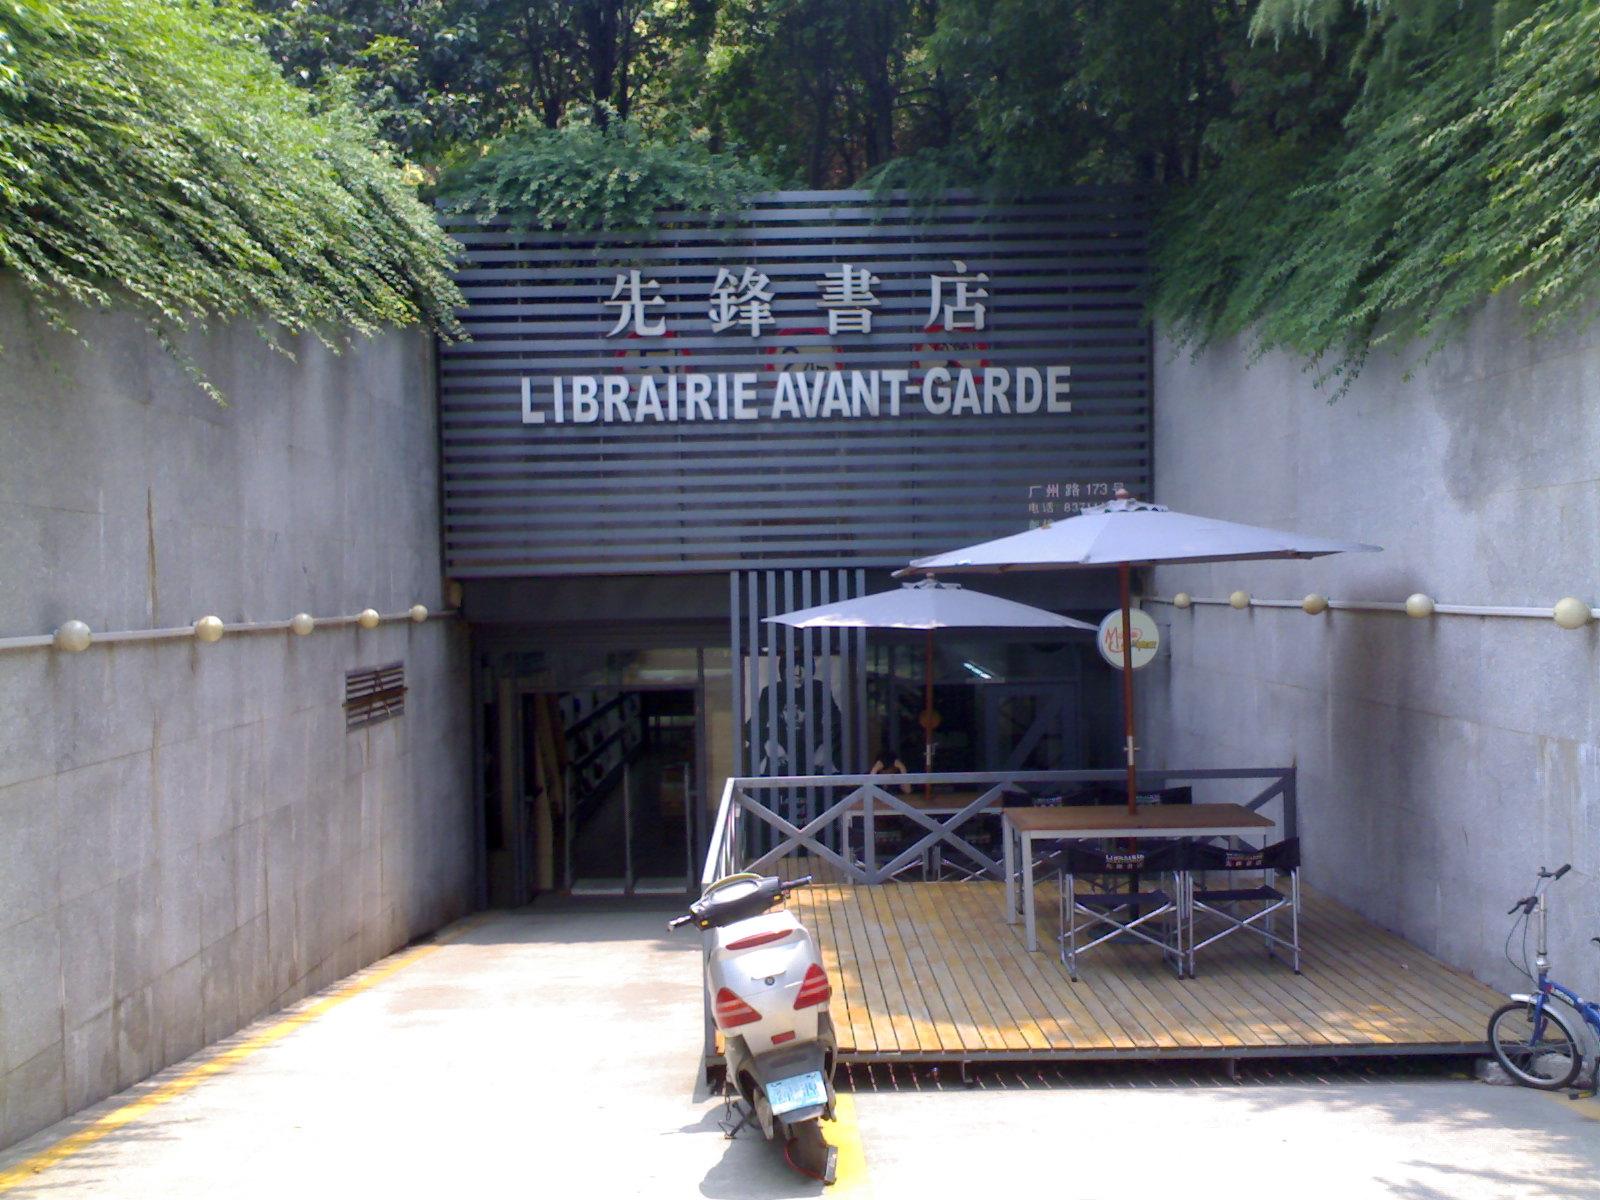 librarie avant-garde_Nanjing